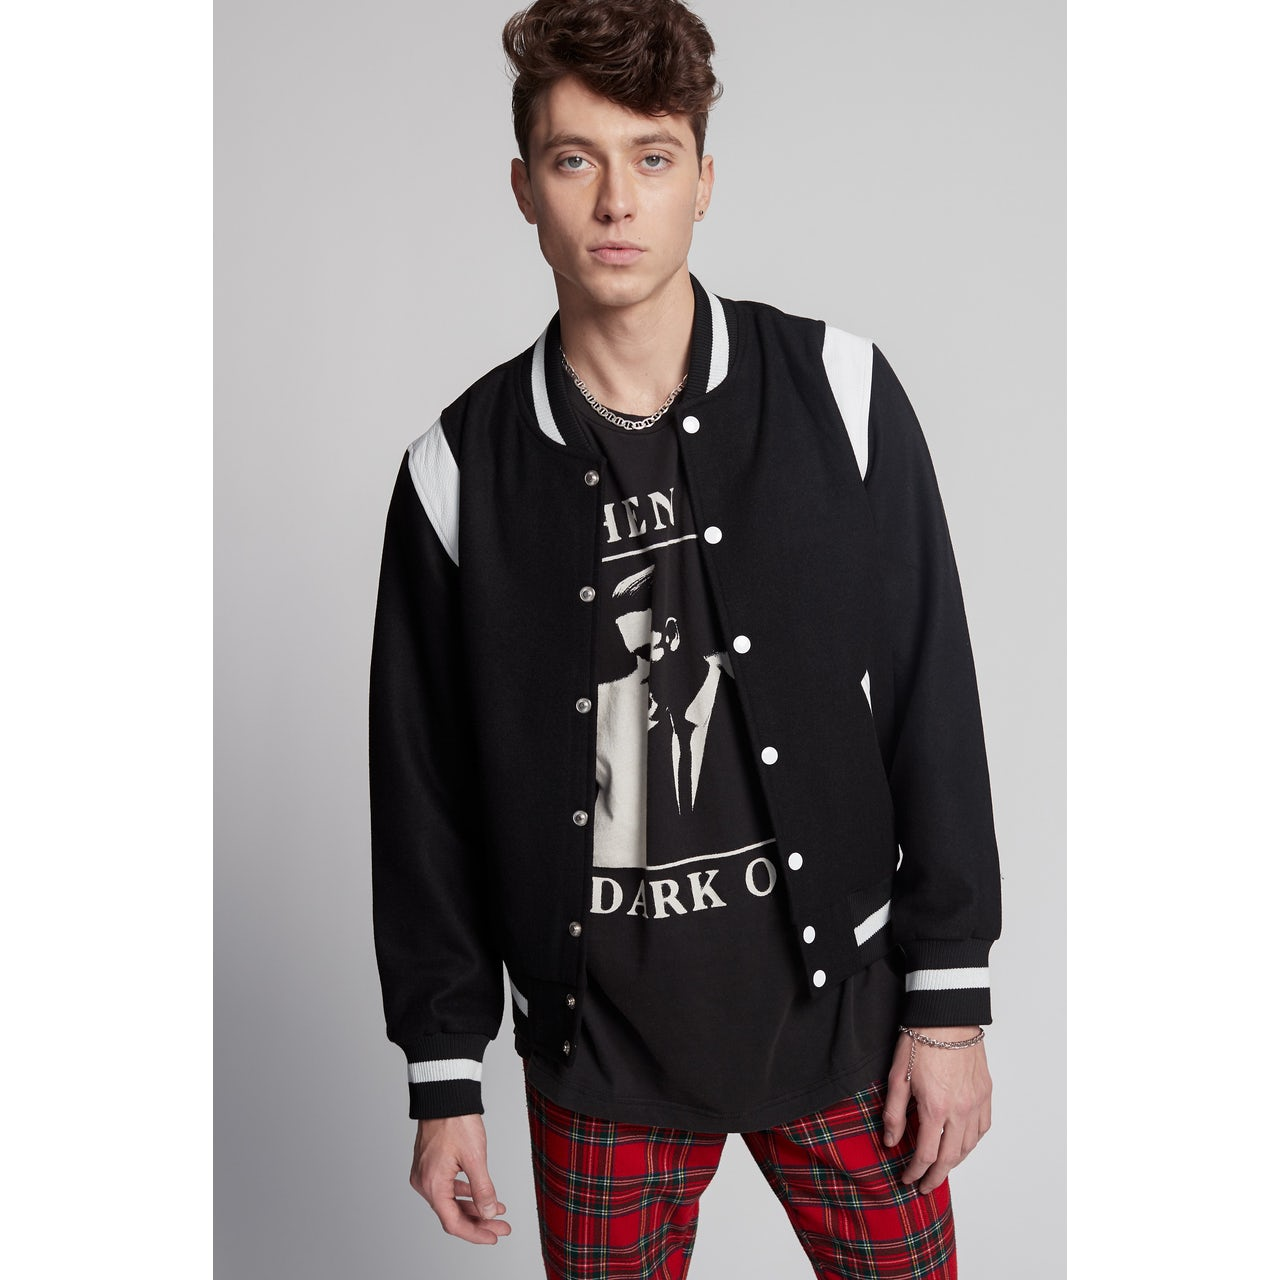 9ec884dd3 G-Eazy Ladykillers Classic Varsity Jacket